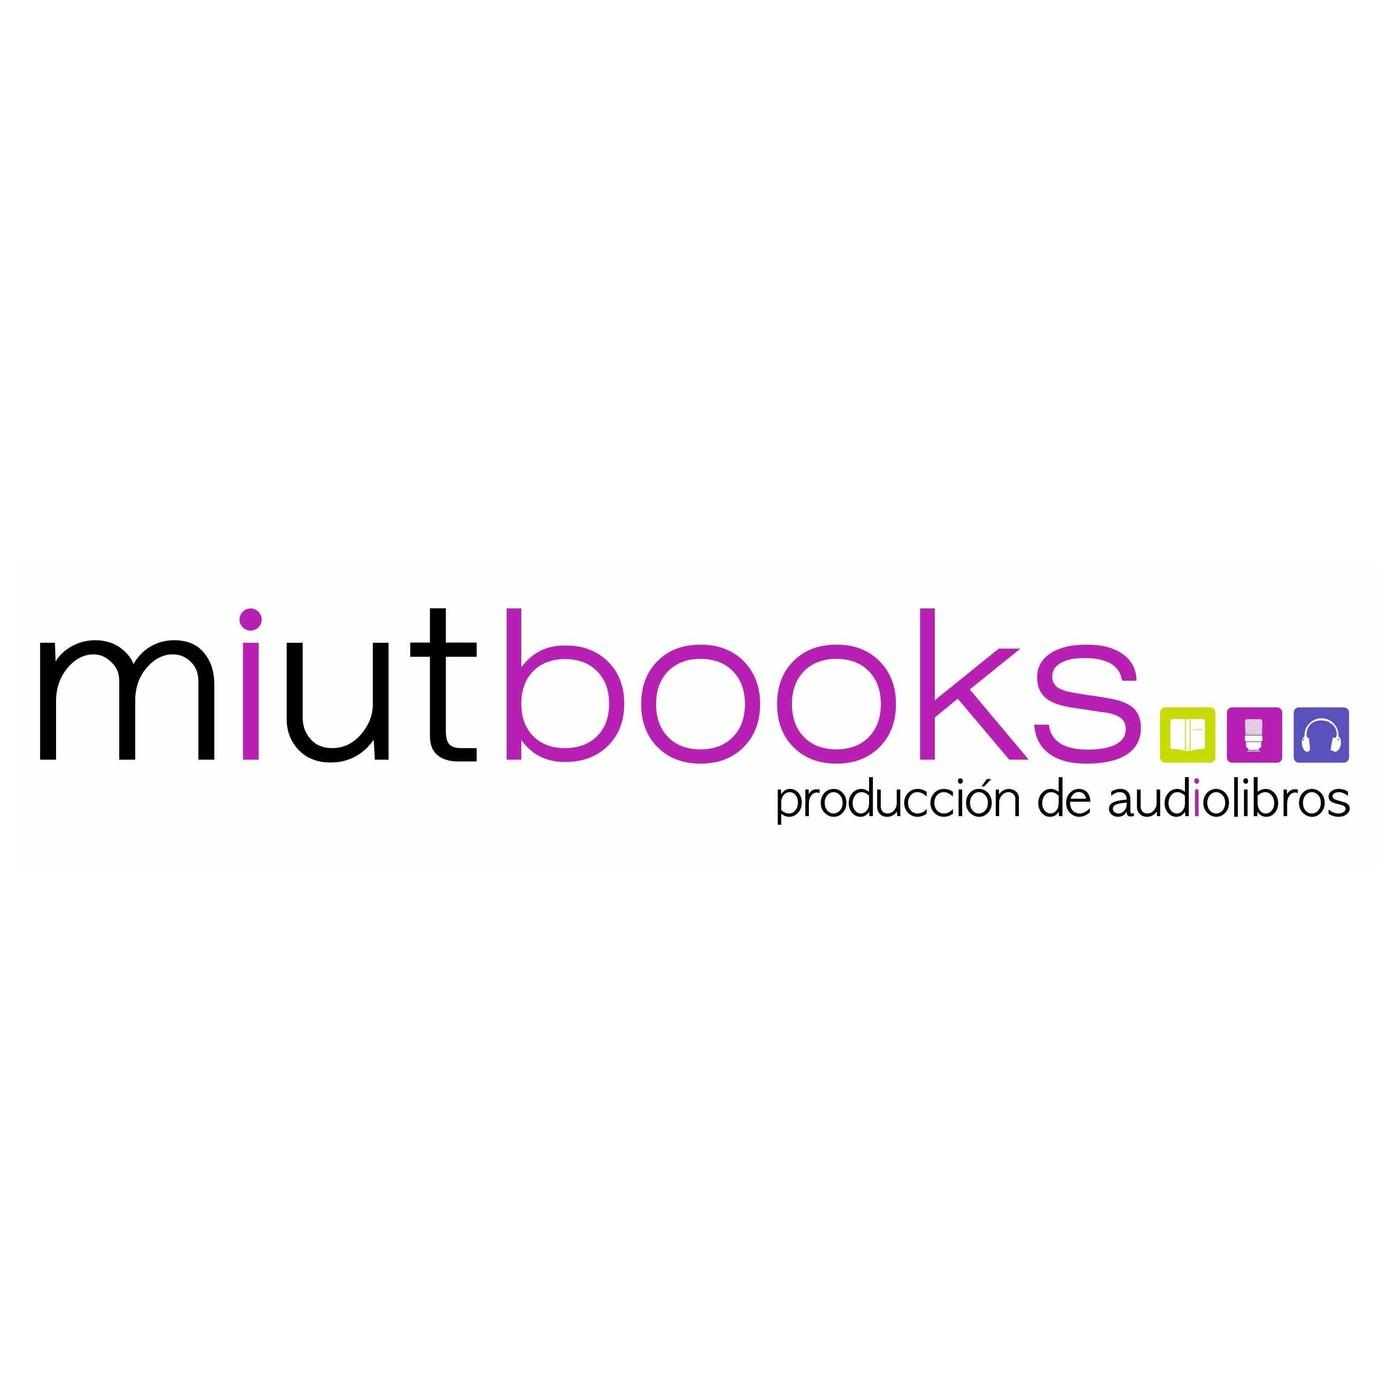 MIUTBOOKS